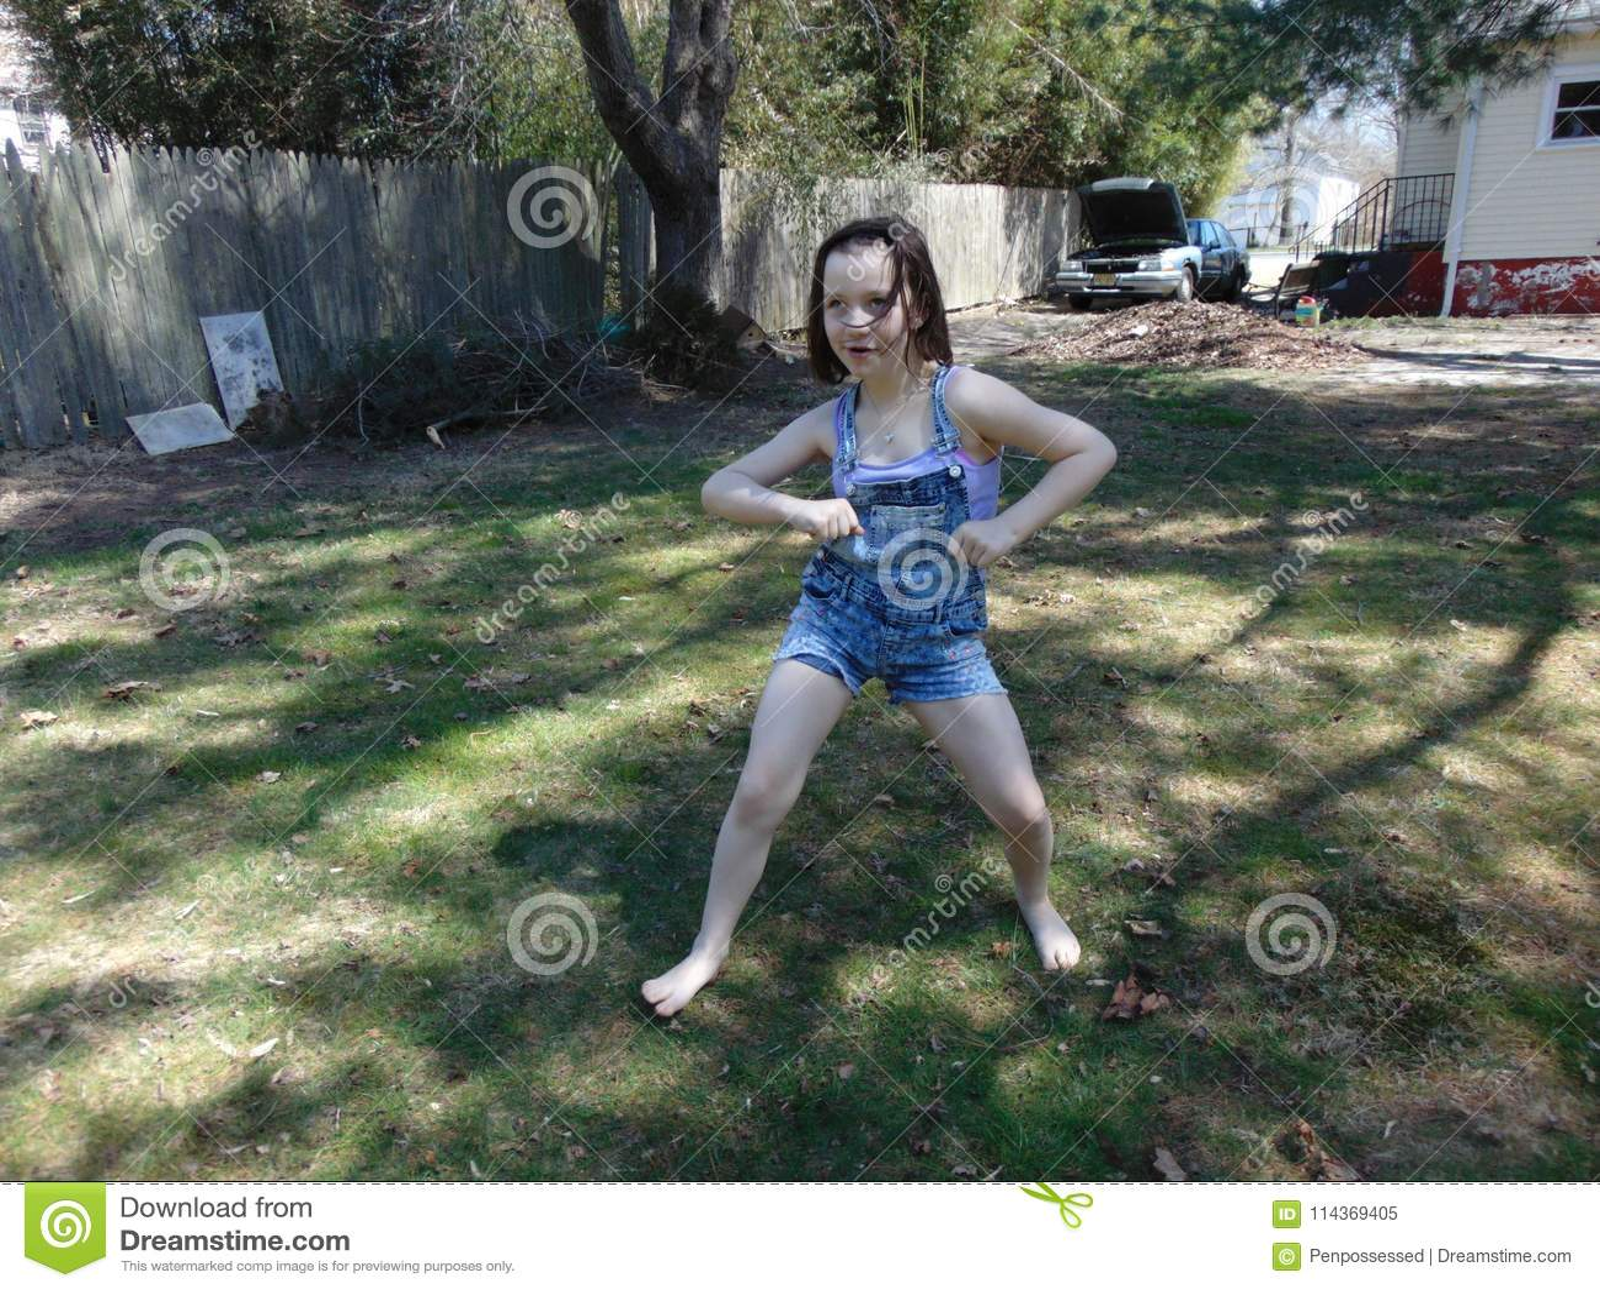 Michelle hunzinger nude